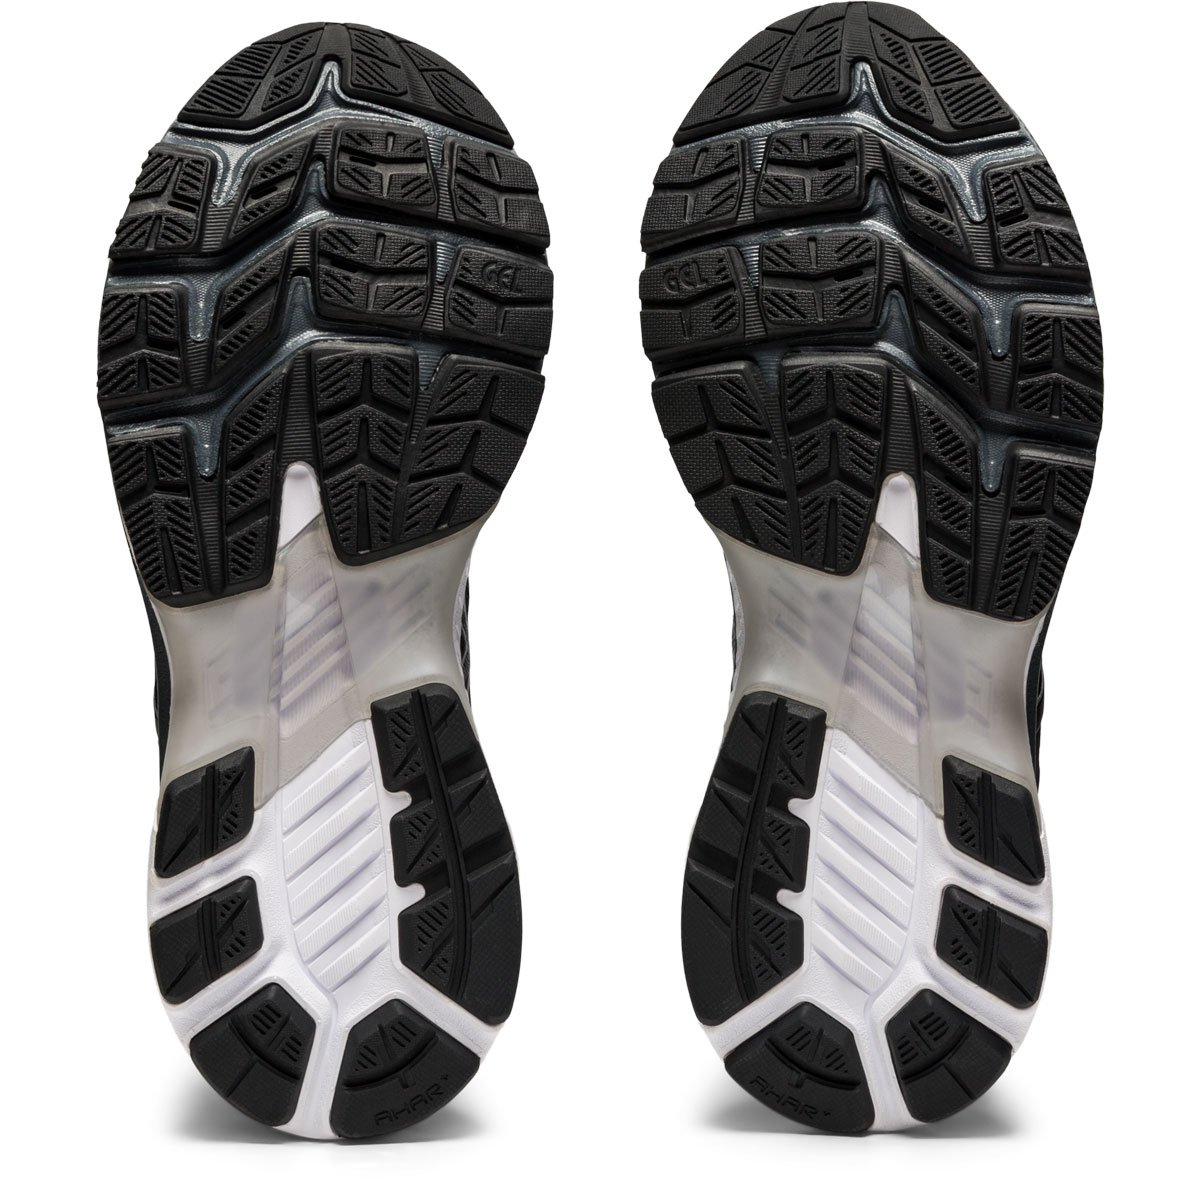 Women's Asics GEL-Kayano 27 Running Shoe - Color: Black/Pure Silv (Regular Width) - Size: 5, Black/Pure Silv, large, image 7